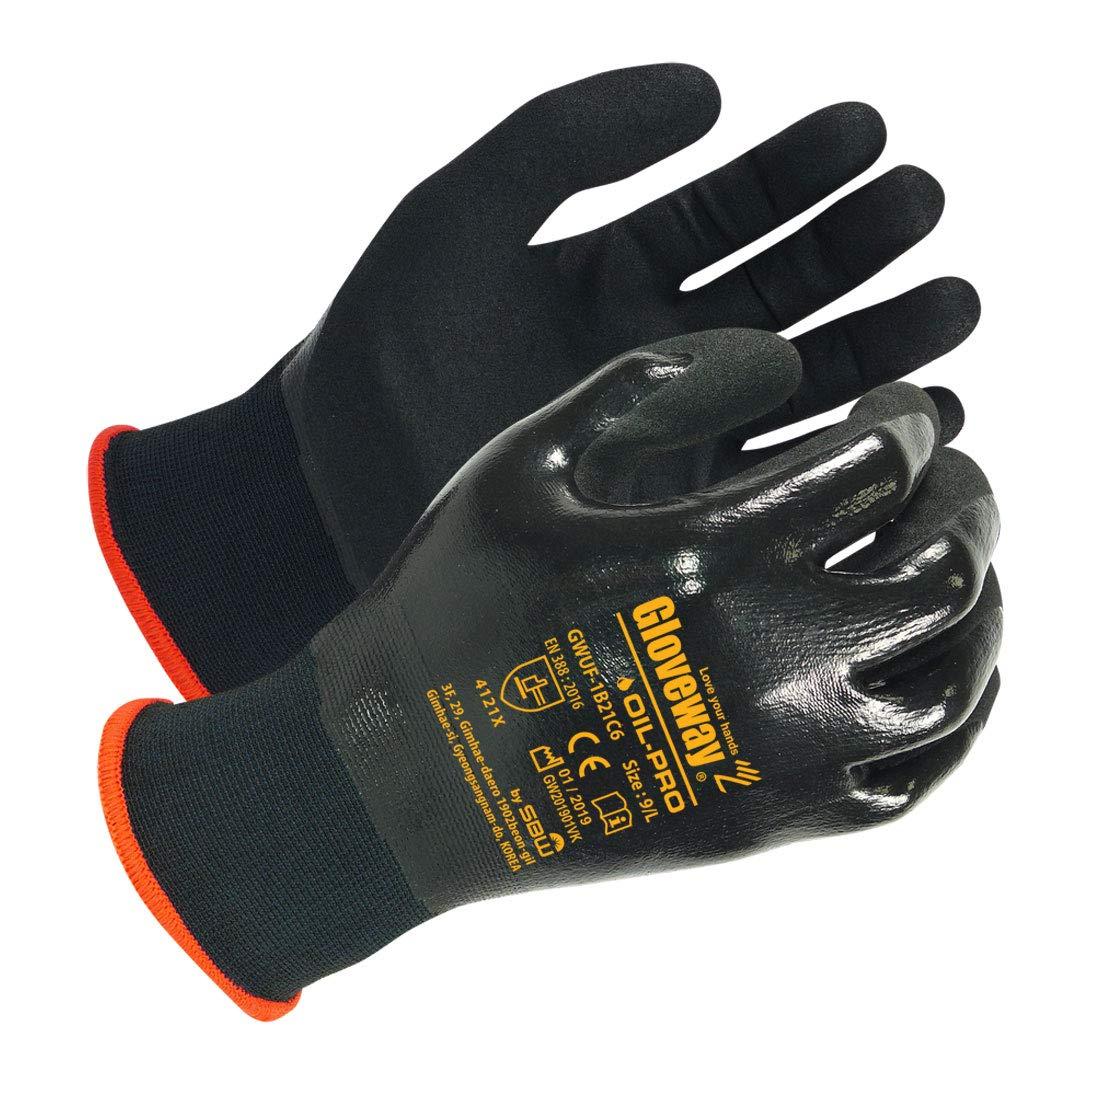 GLOVEWAY Oil Resistant Gloves (3 Pack) - Double Nitrile Fully Coating, Snug Fit, Excellent Grip & Abrasion Resistance, High Dexterity, 18 Gauge Gloves - L Size